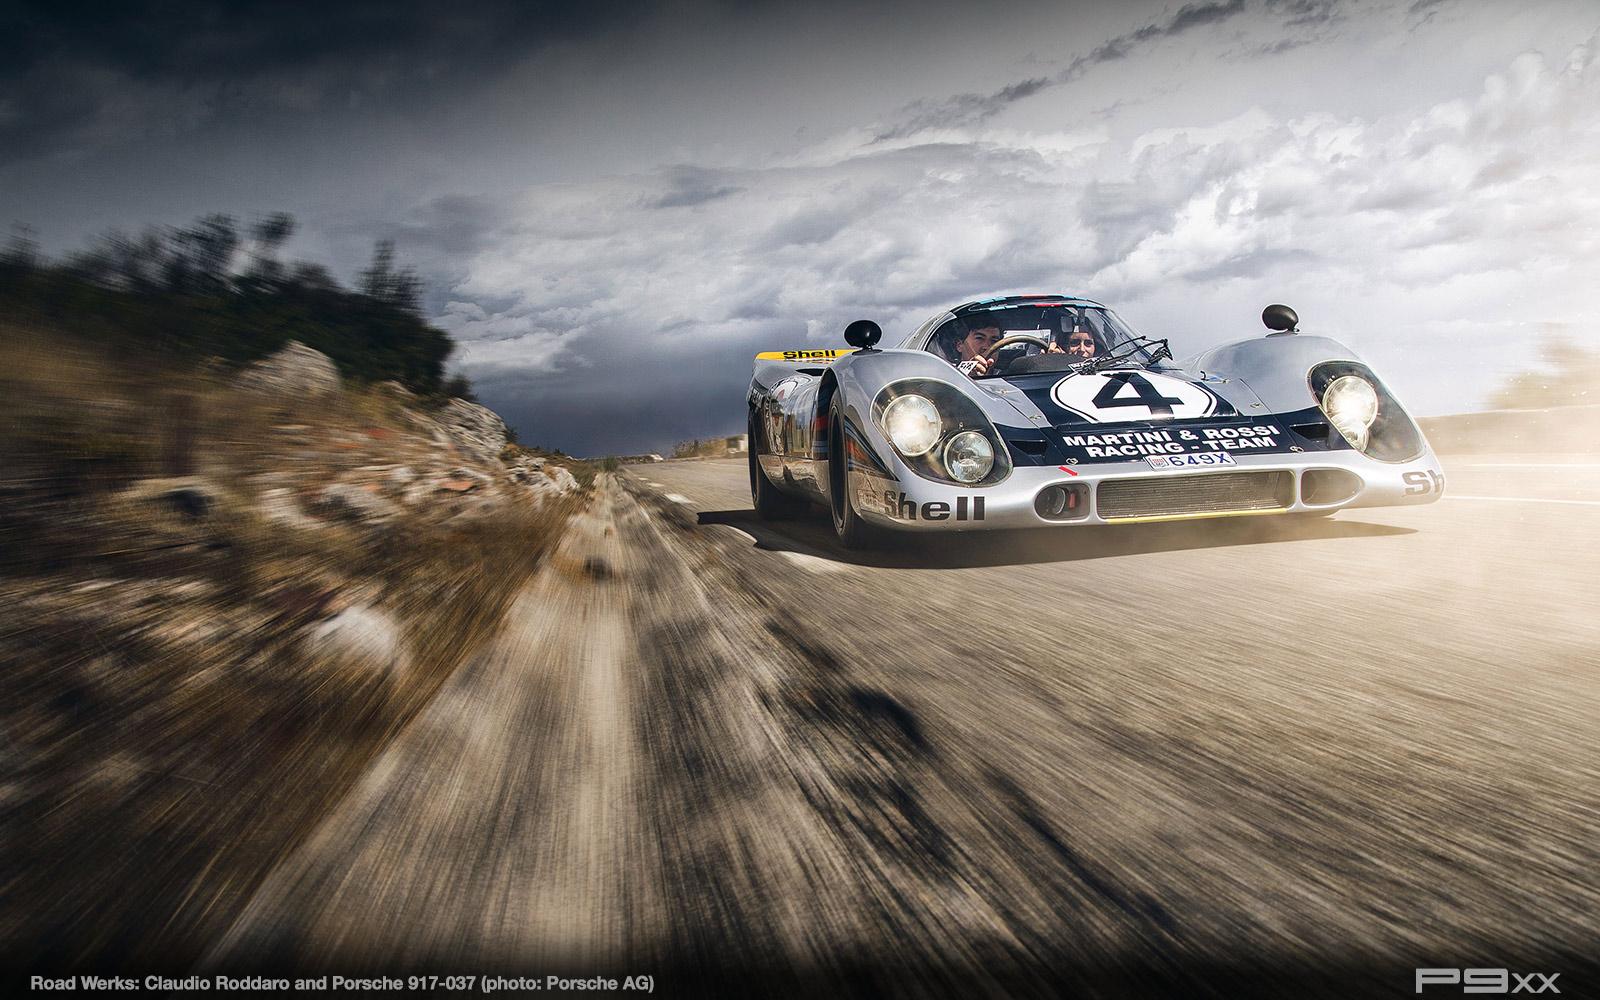 Porsche-917-037-Martini-Racing-Monaco-2018-313